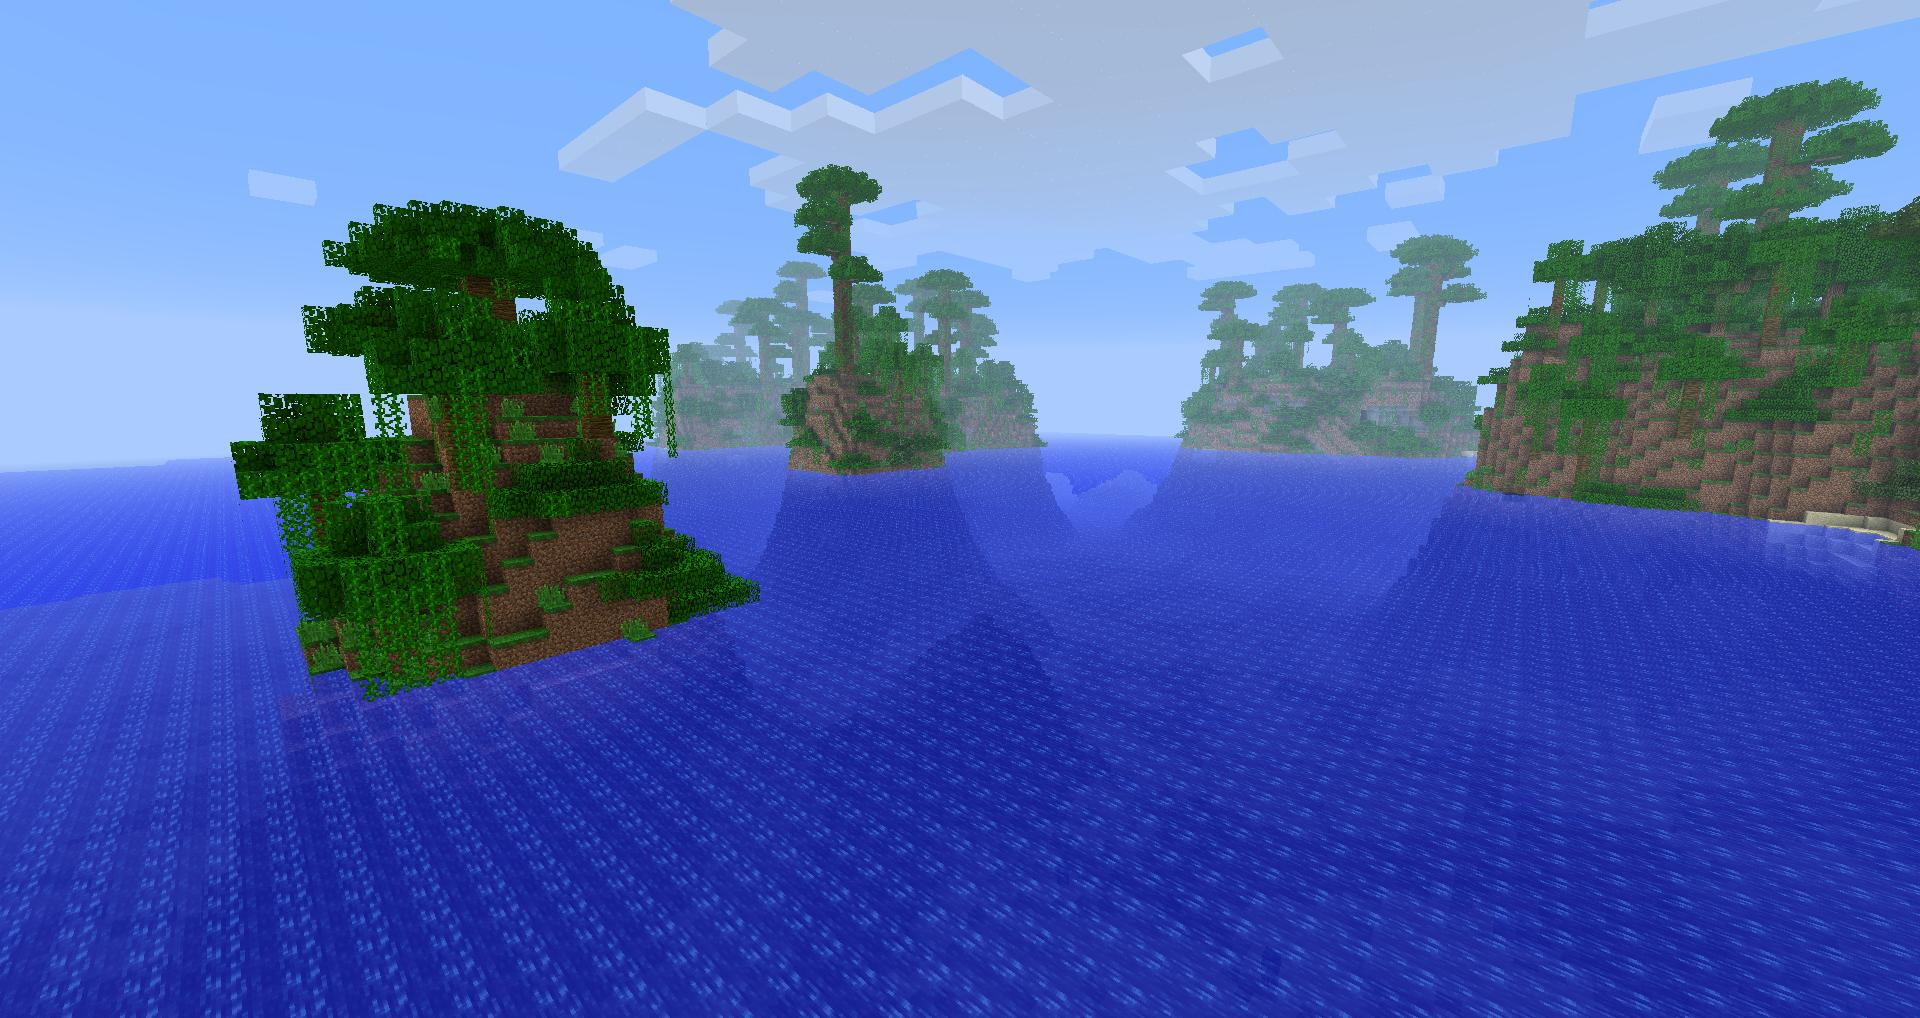 https://i2.wp.com/cdn.9pety.com/imgs/Mods/Ocean-Adventures-Mod-3.jpg?ssl=1